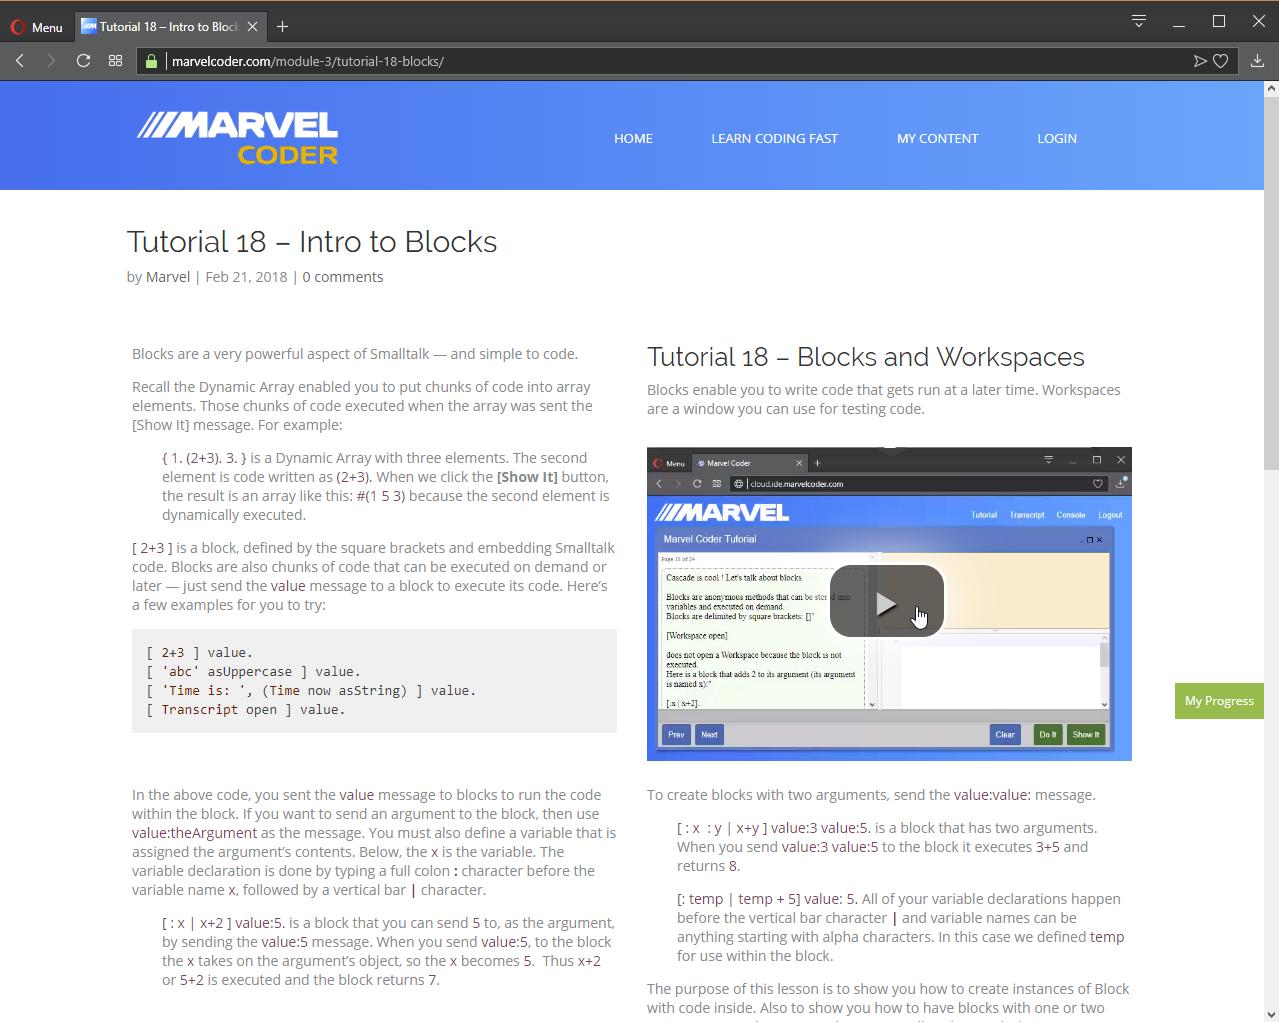 Web Development Software, MarvelCoder — Learn Coding Fast Screenshot